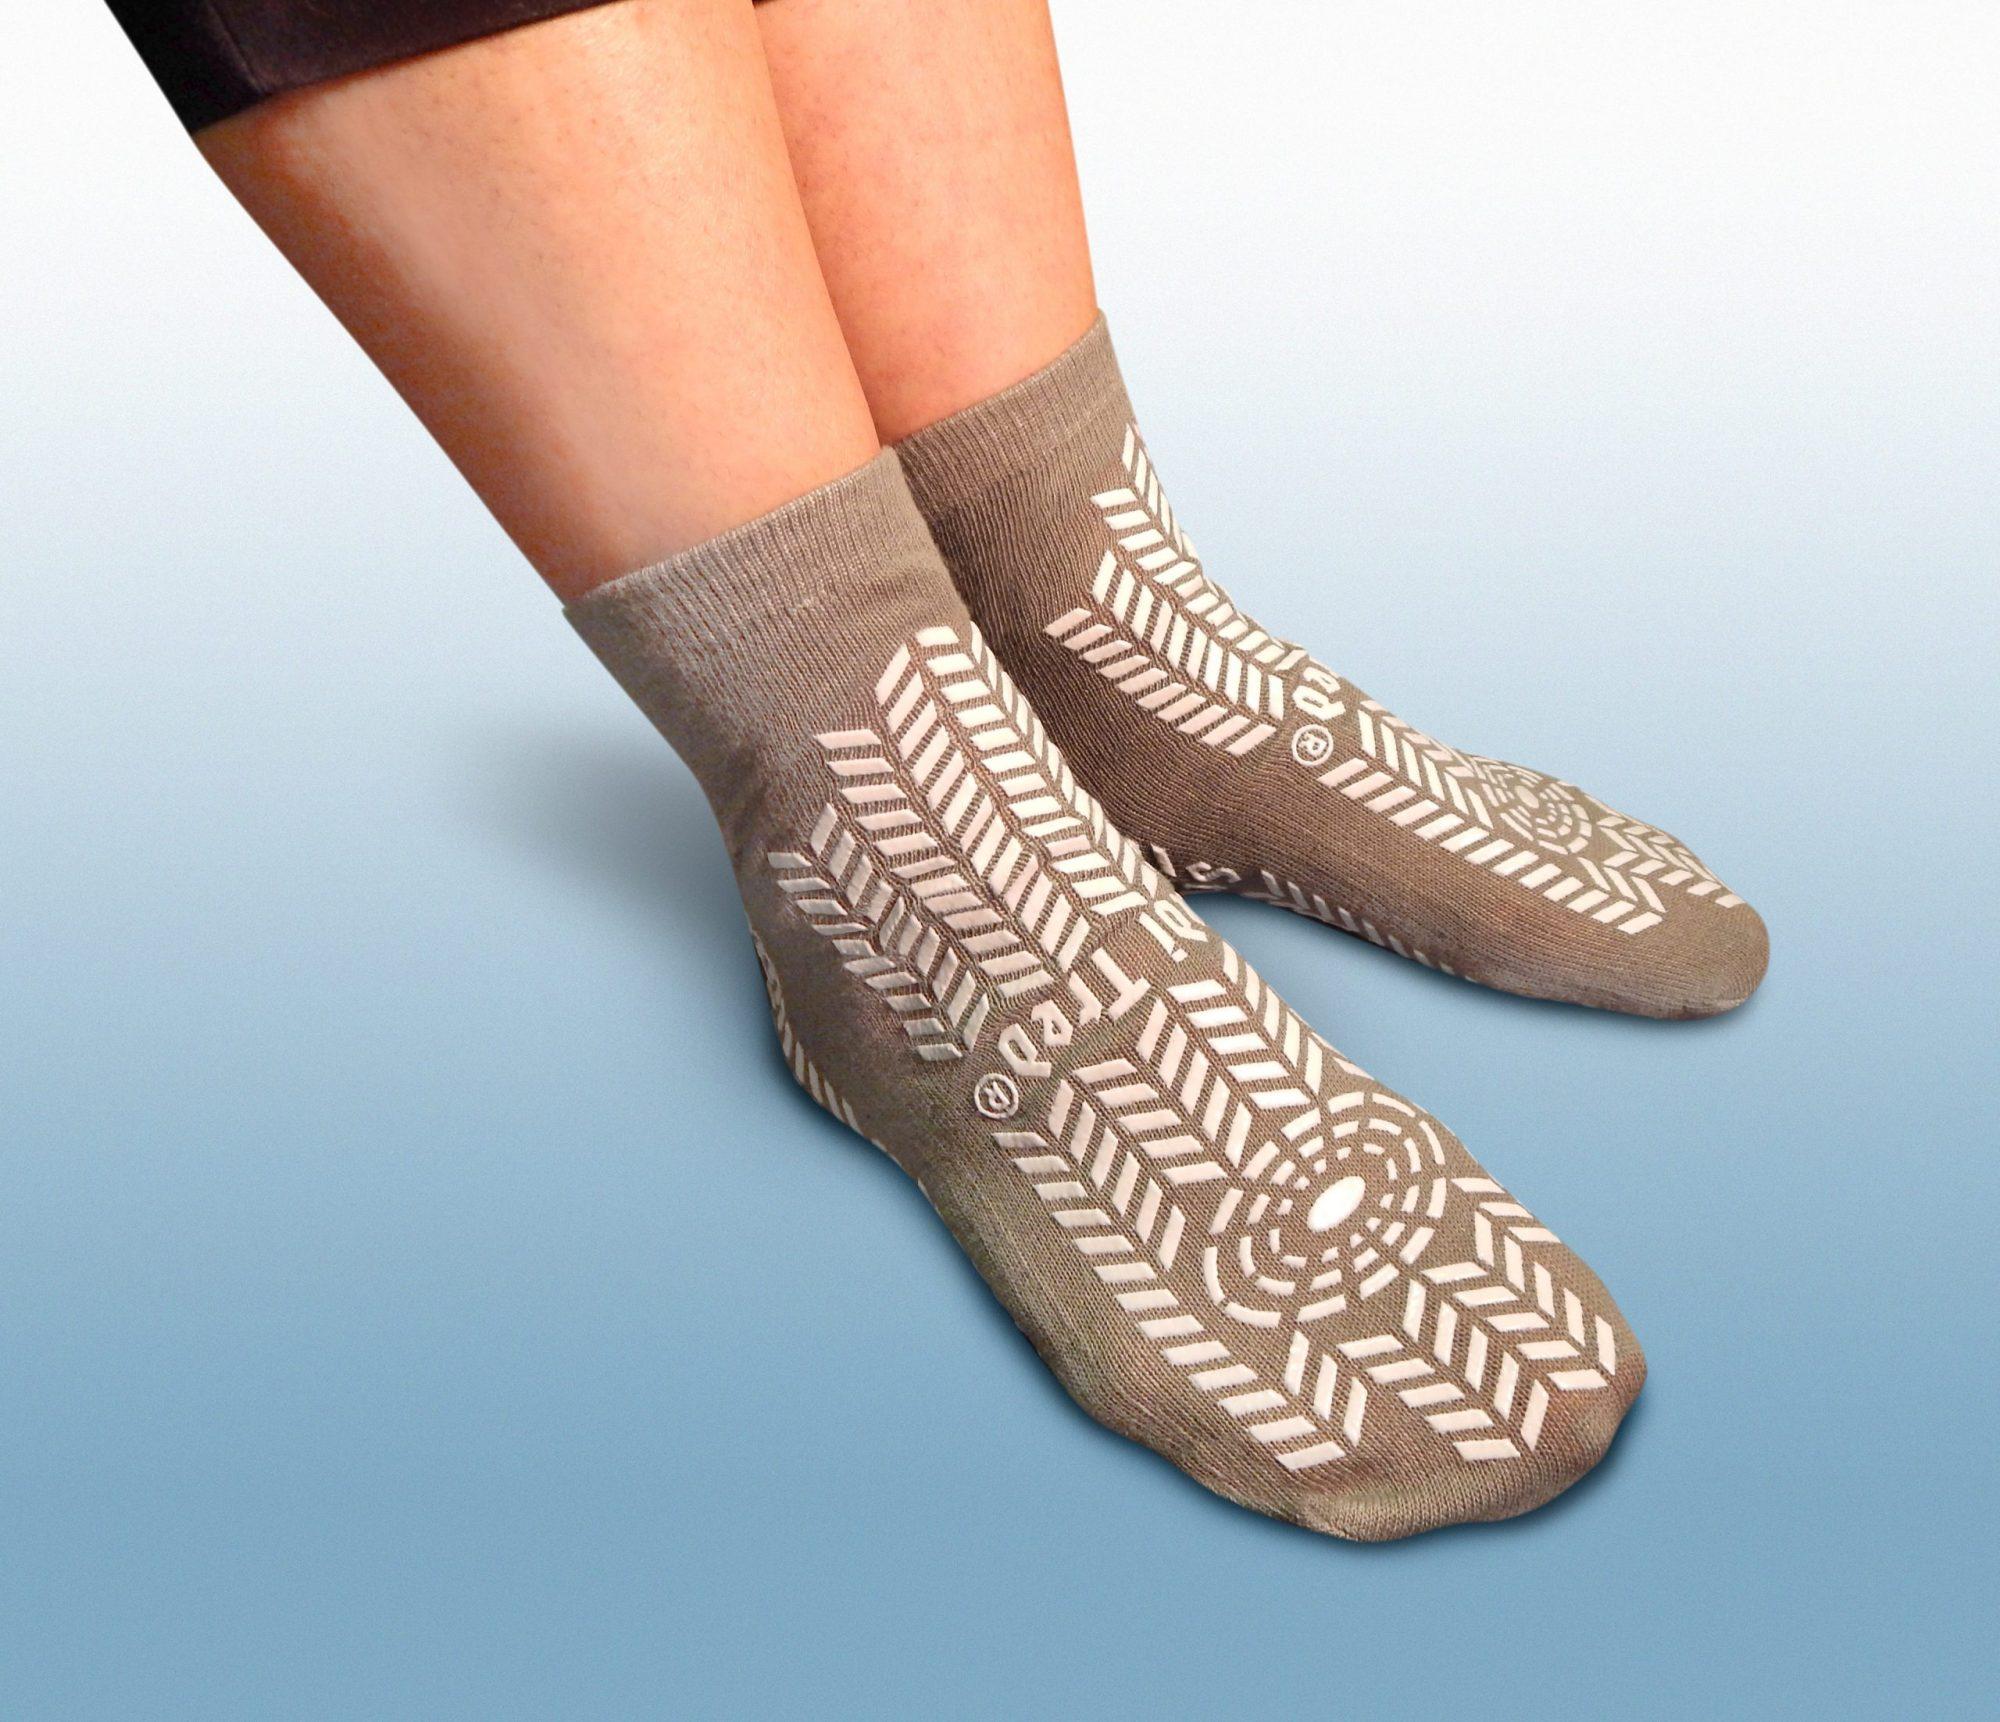 NEW!! Stedi Tred Fall Prevention Slippers